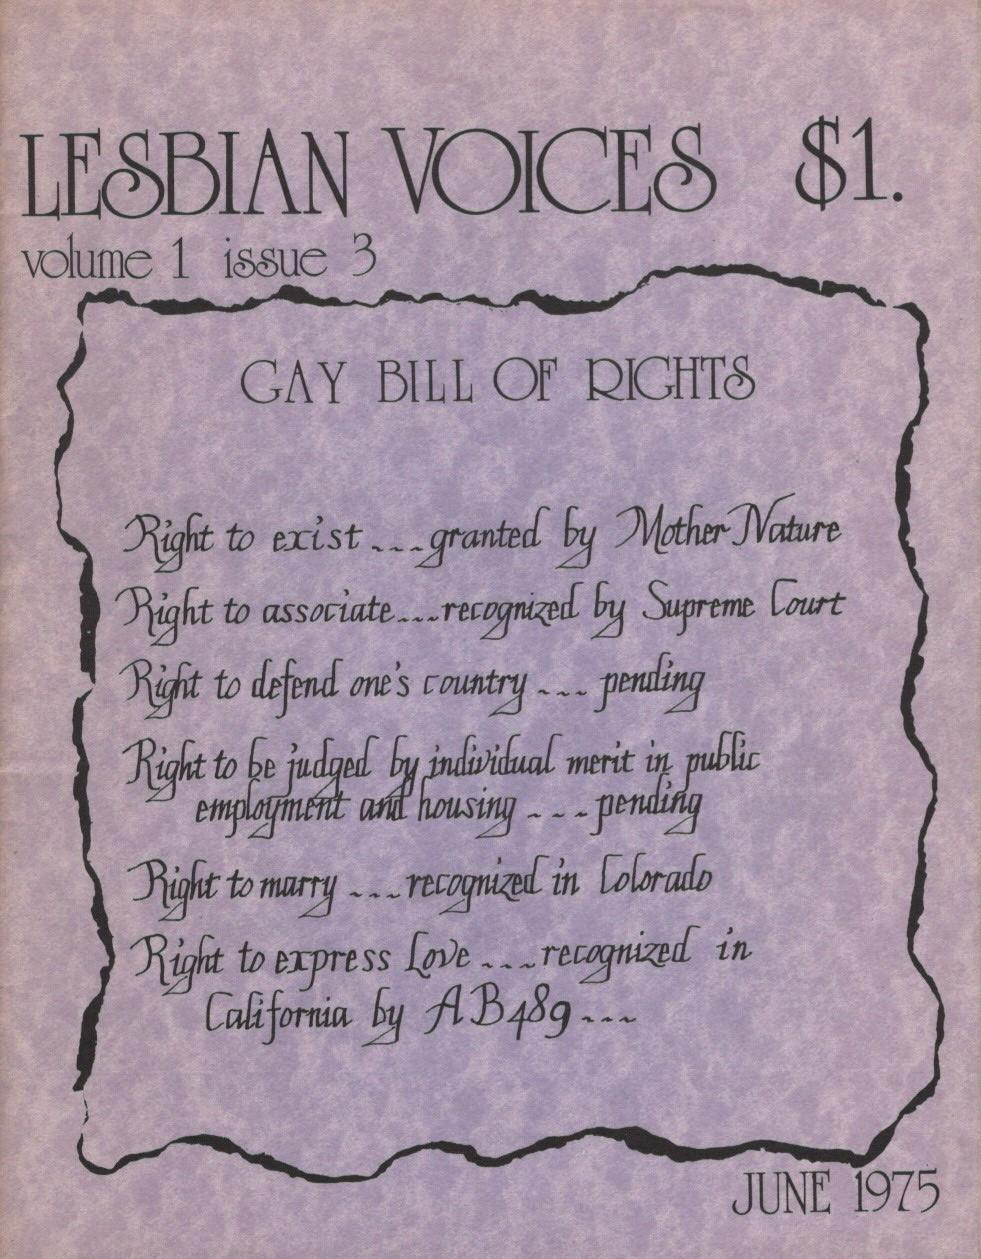 lesbian voices cover 3